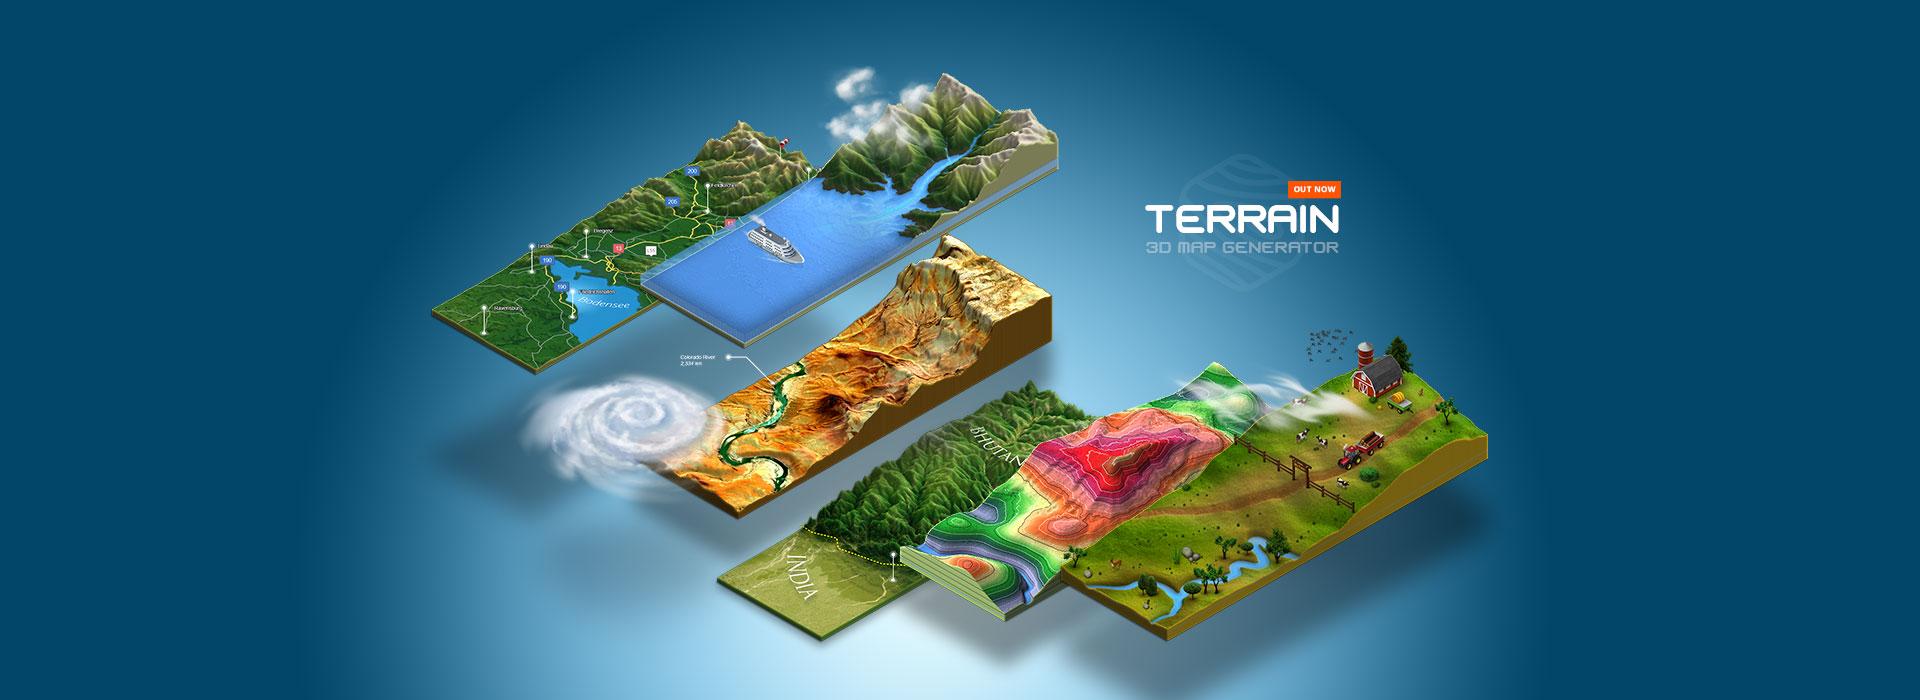 3D Map Generator u2013 Terrain www3d map generatorcom